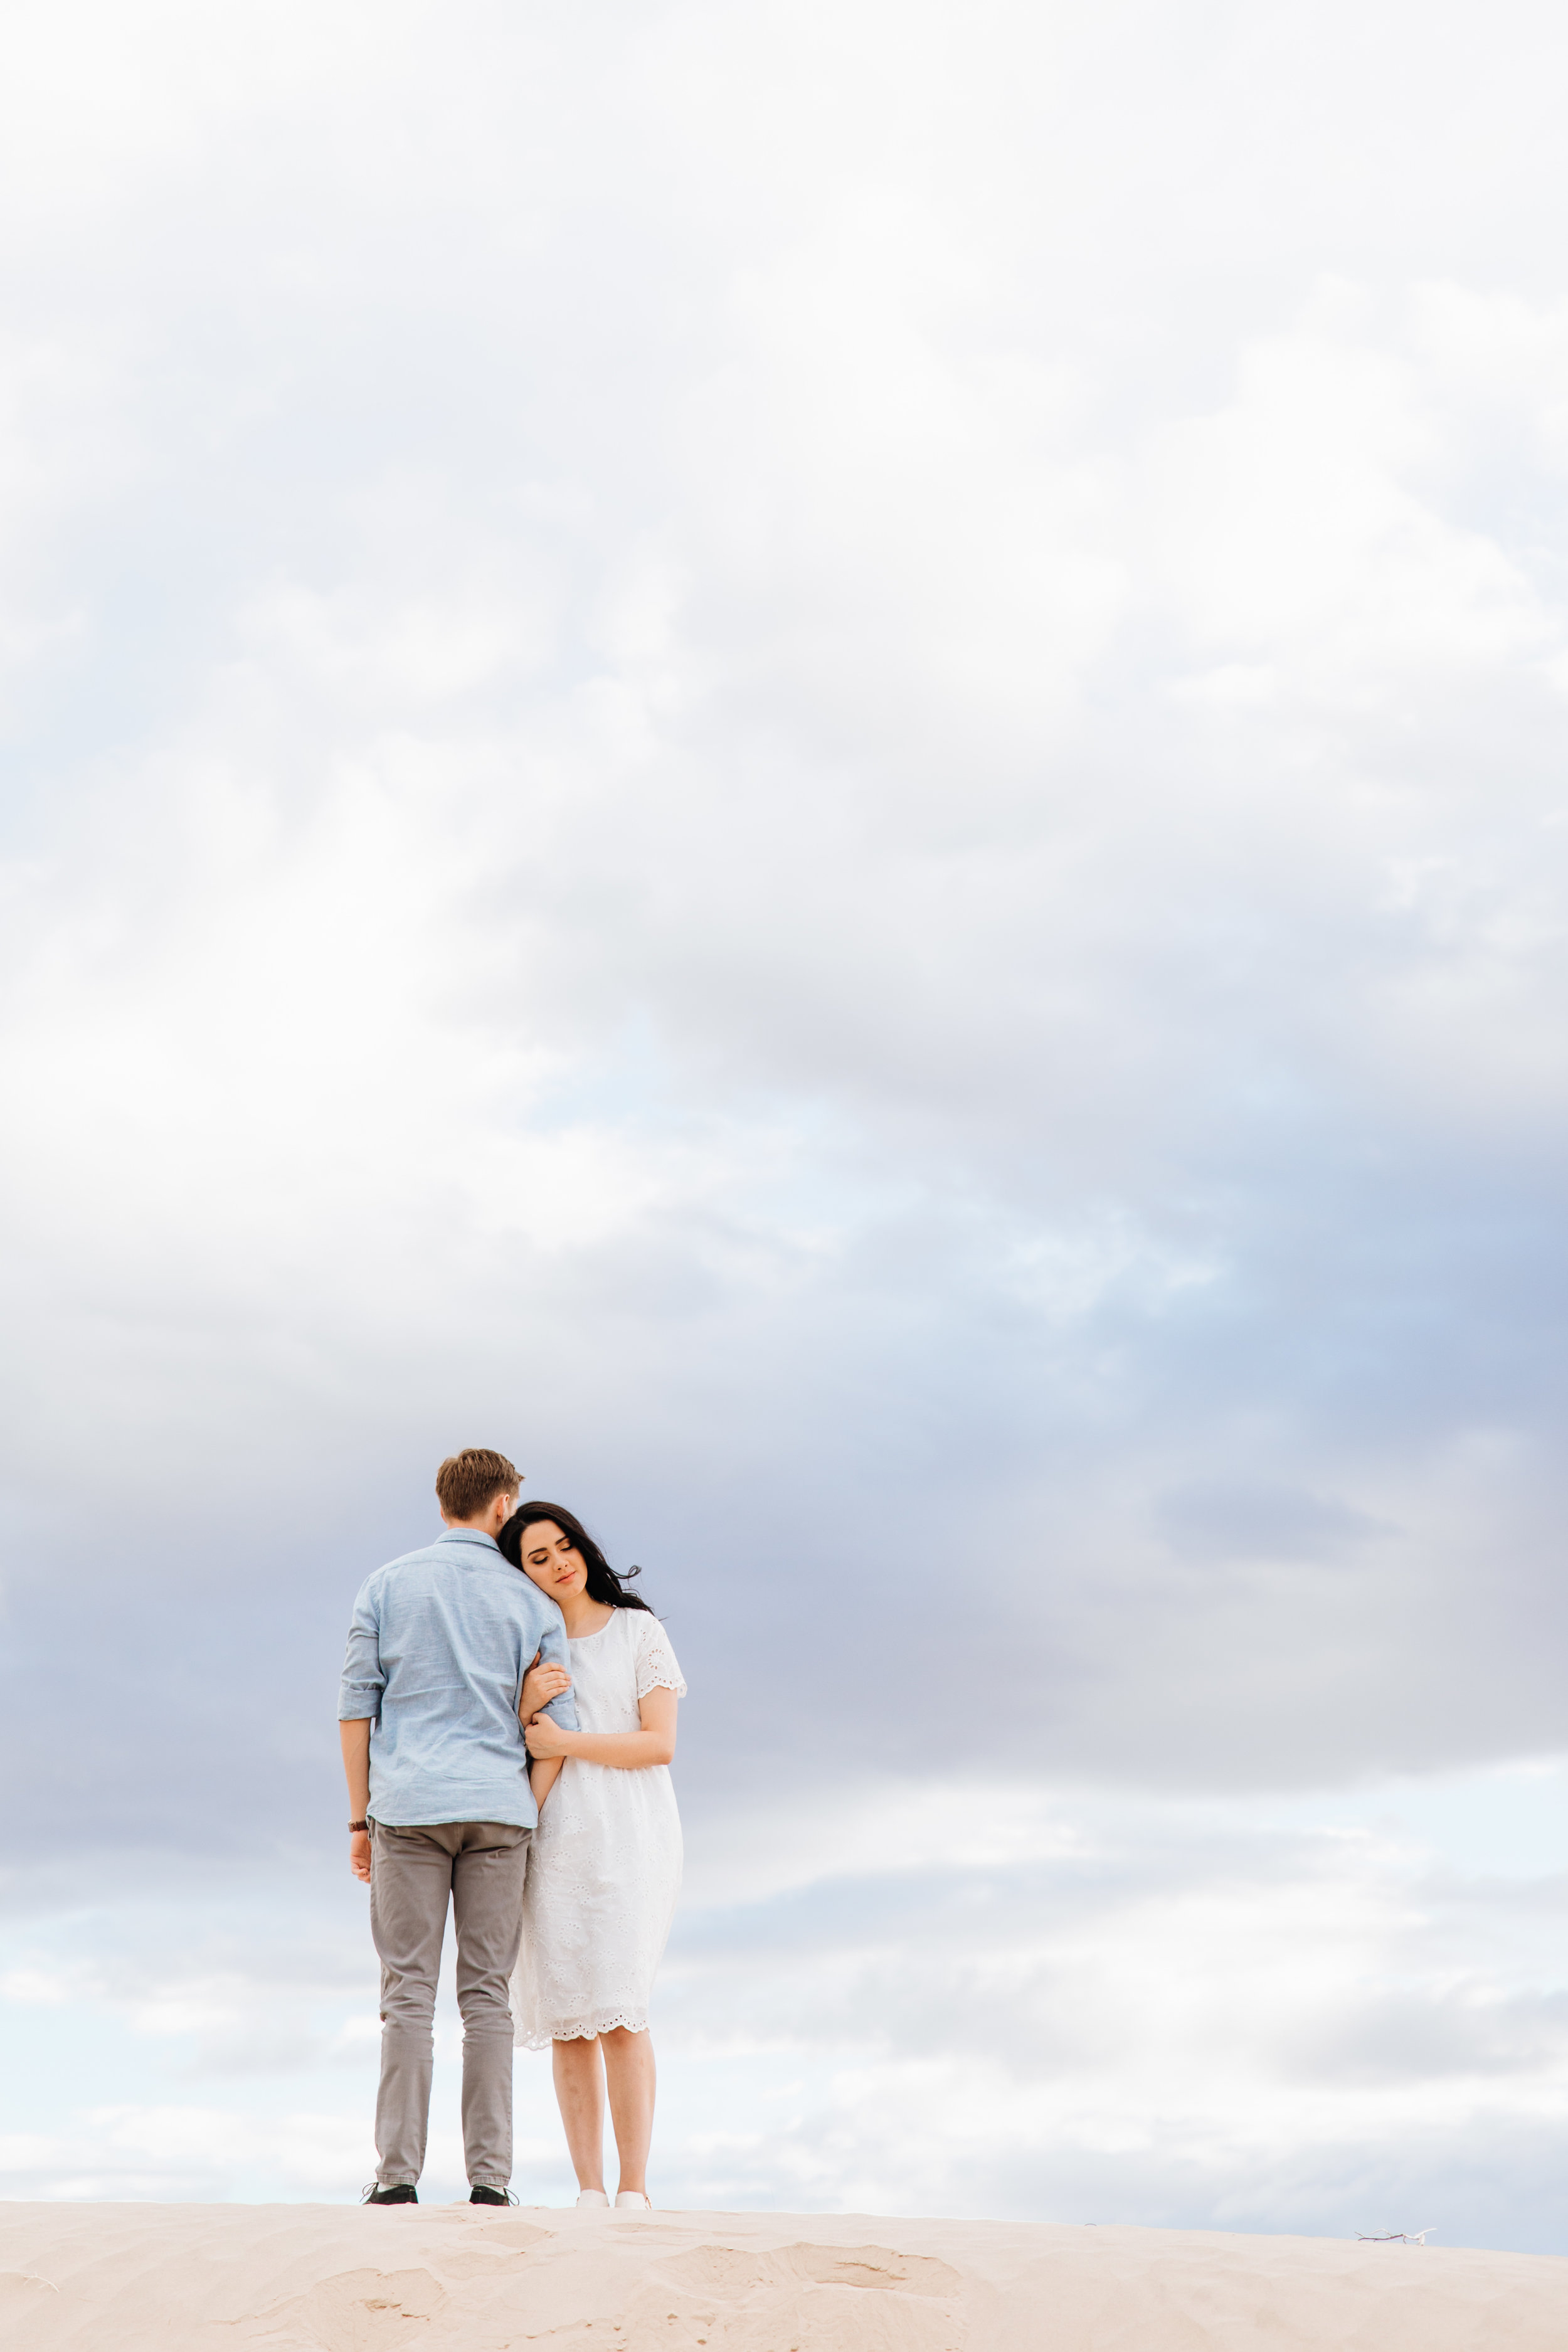 little-sahara-recreation-area-elopement-engagement-wedding-photography-michael-cozzens-37.jpg